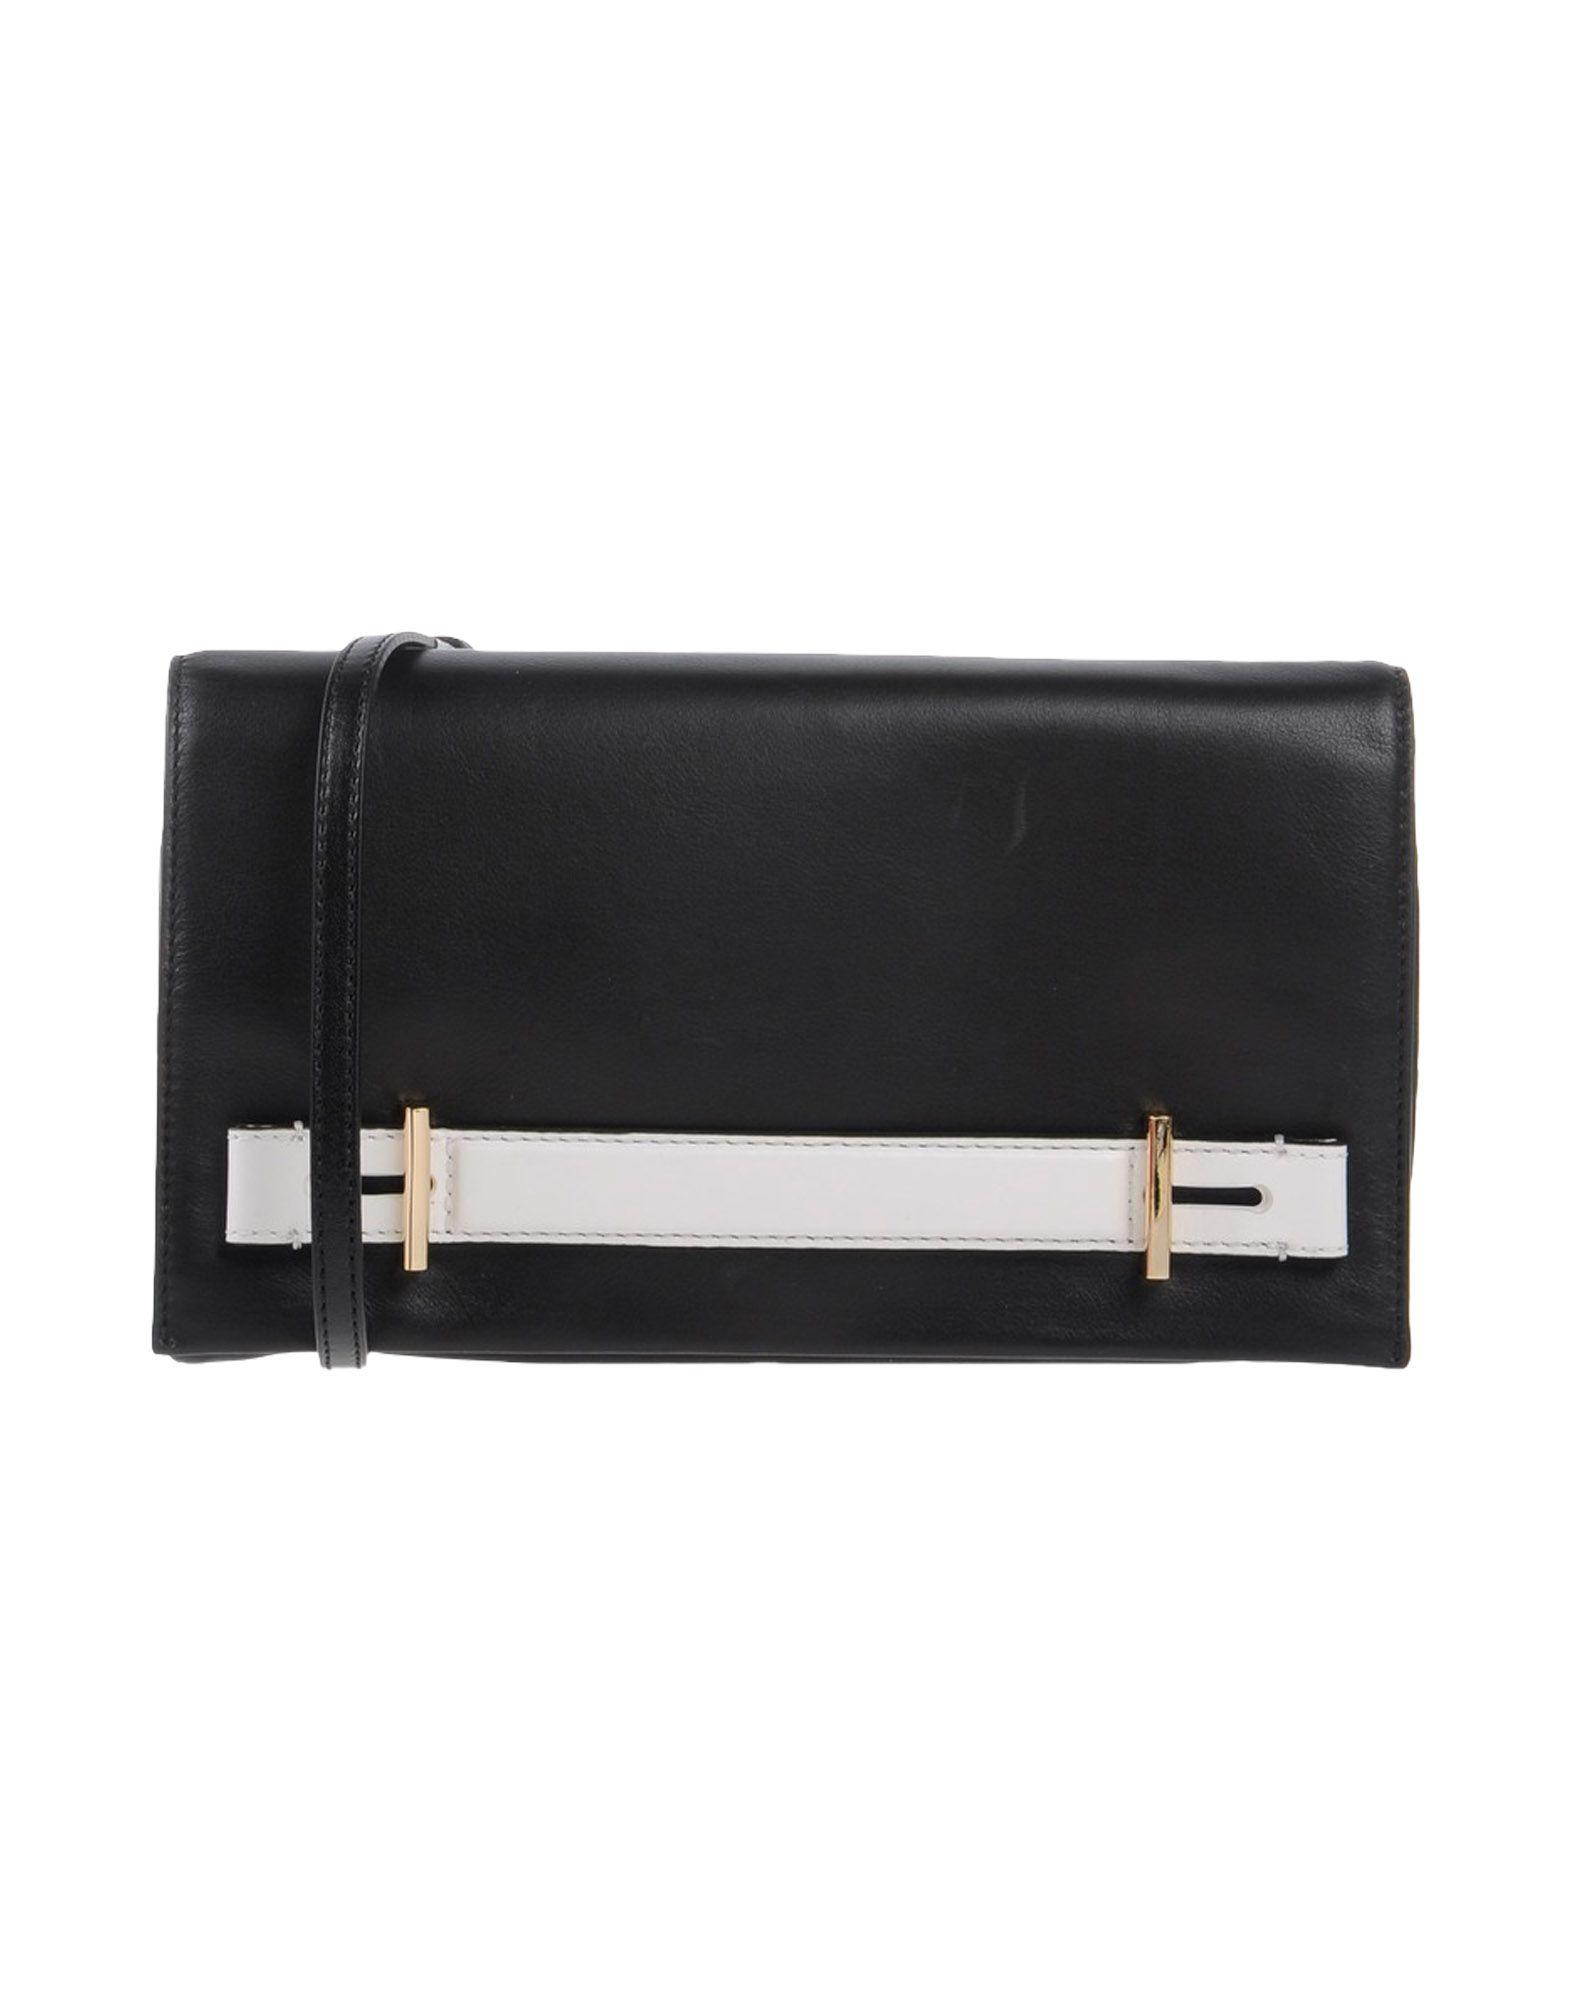 'MICHAEL MICHAEL KORS Handbags